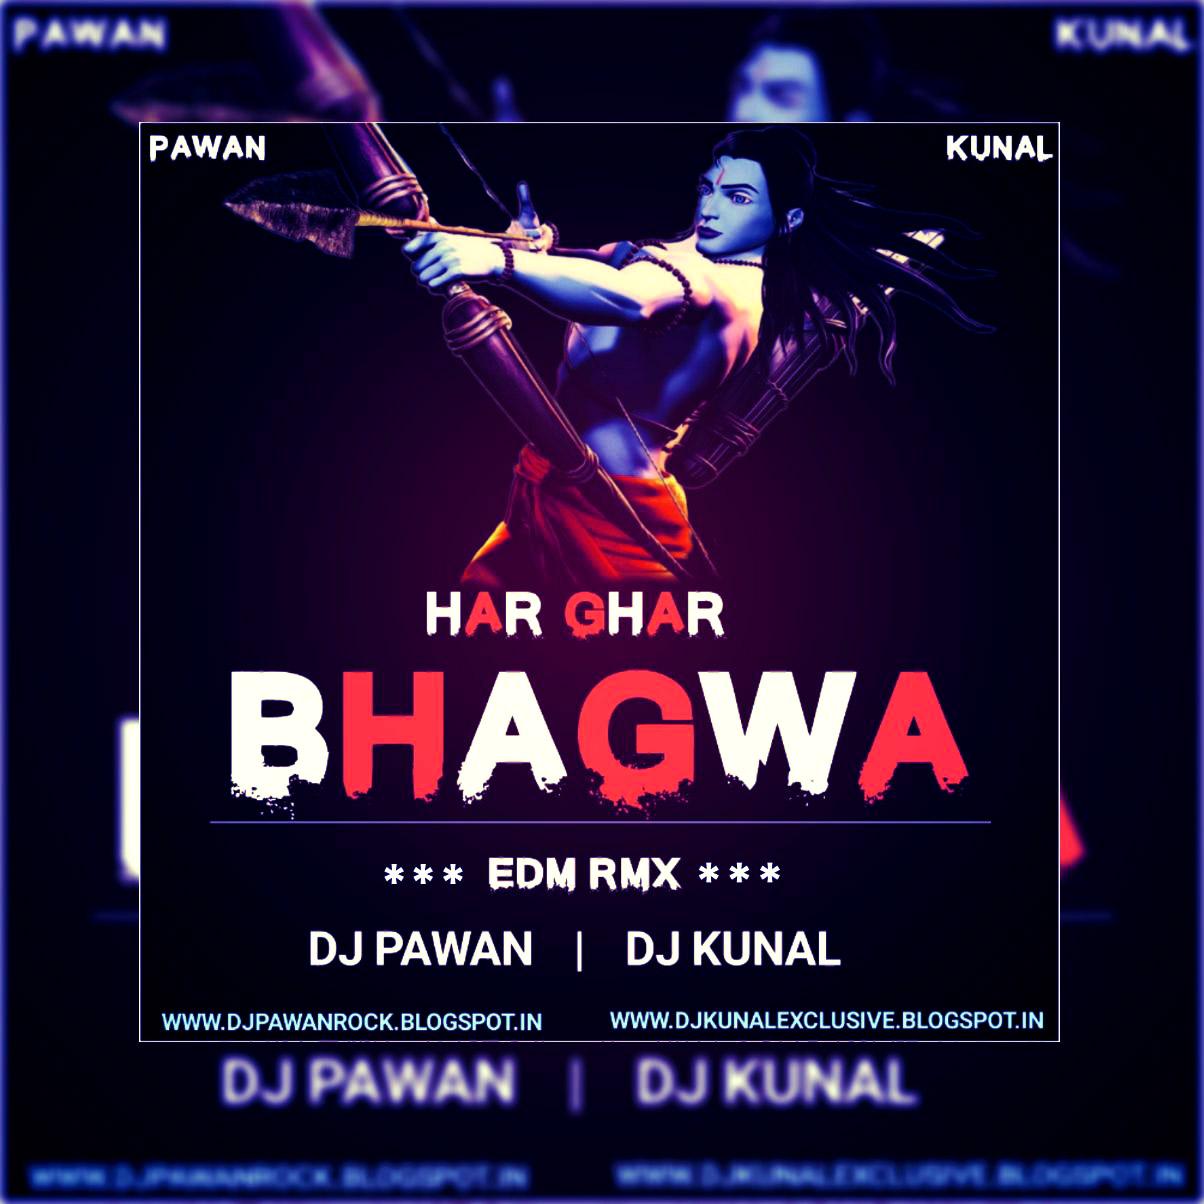 HAR GHAR BHAGWA DJ PAWAN DJ KUNAL - Djs Of MP